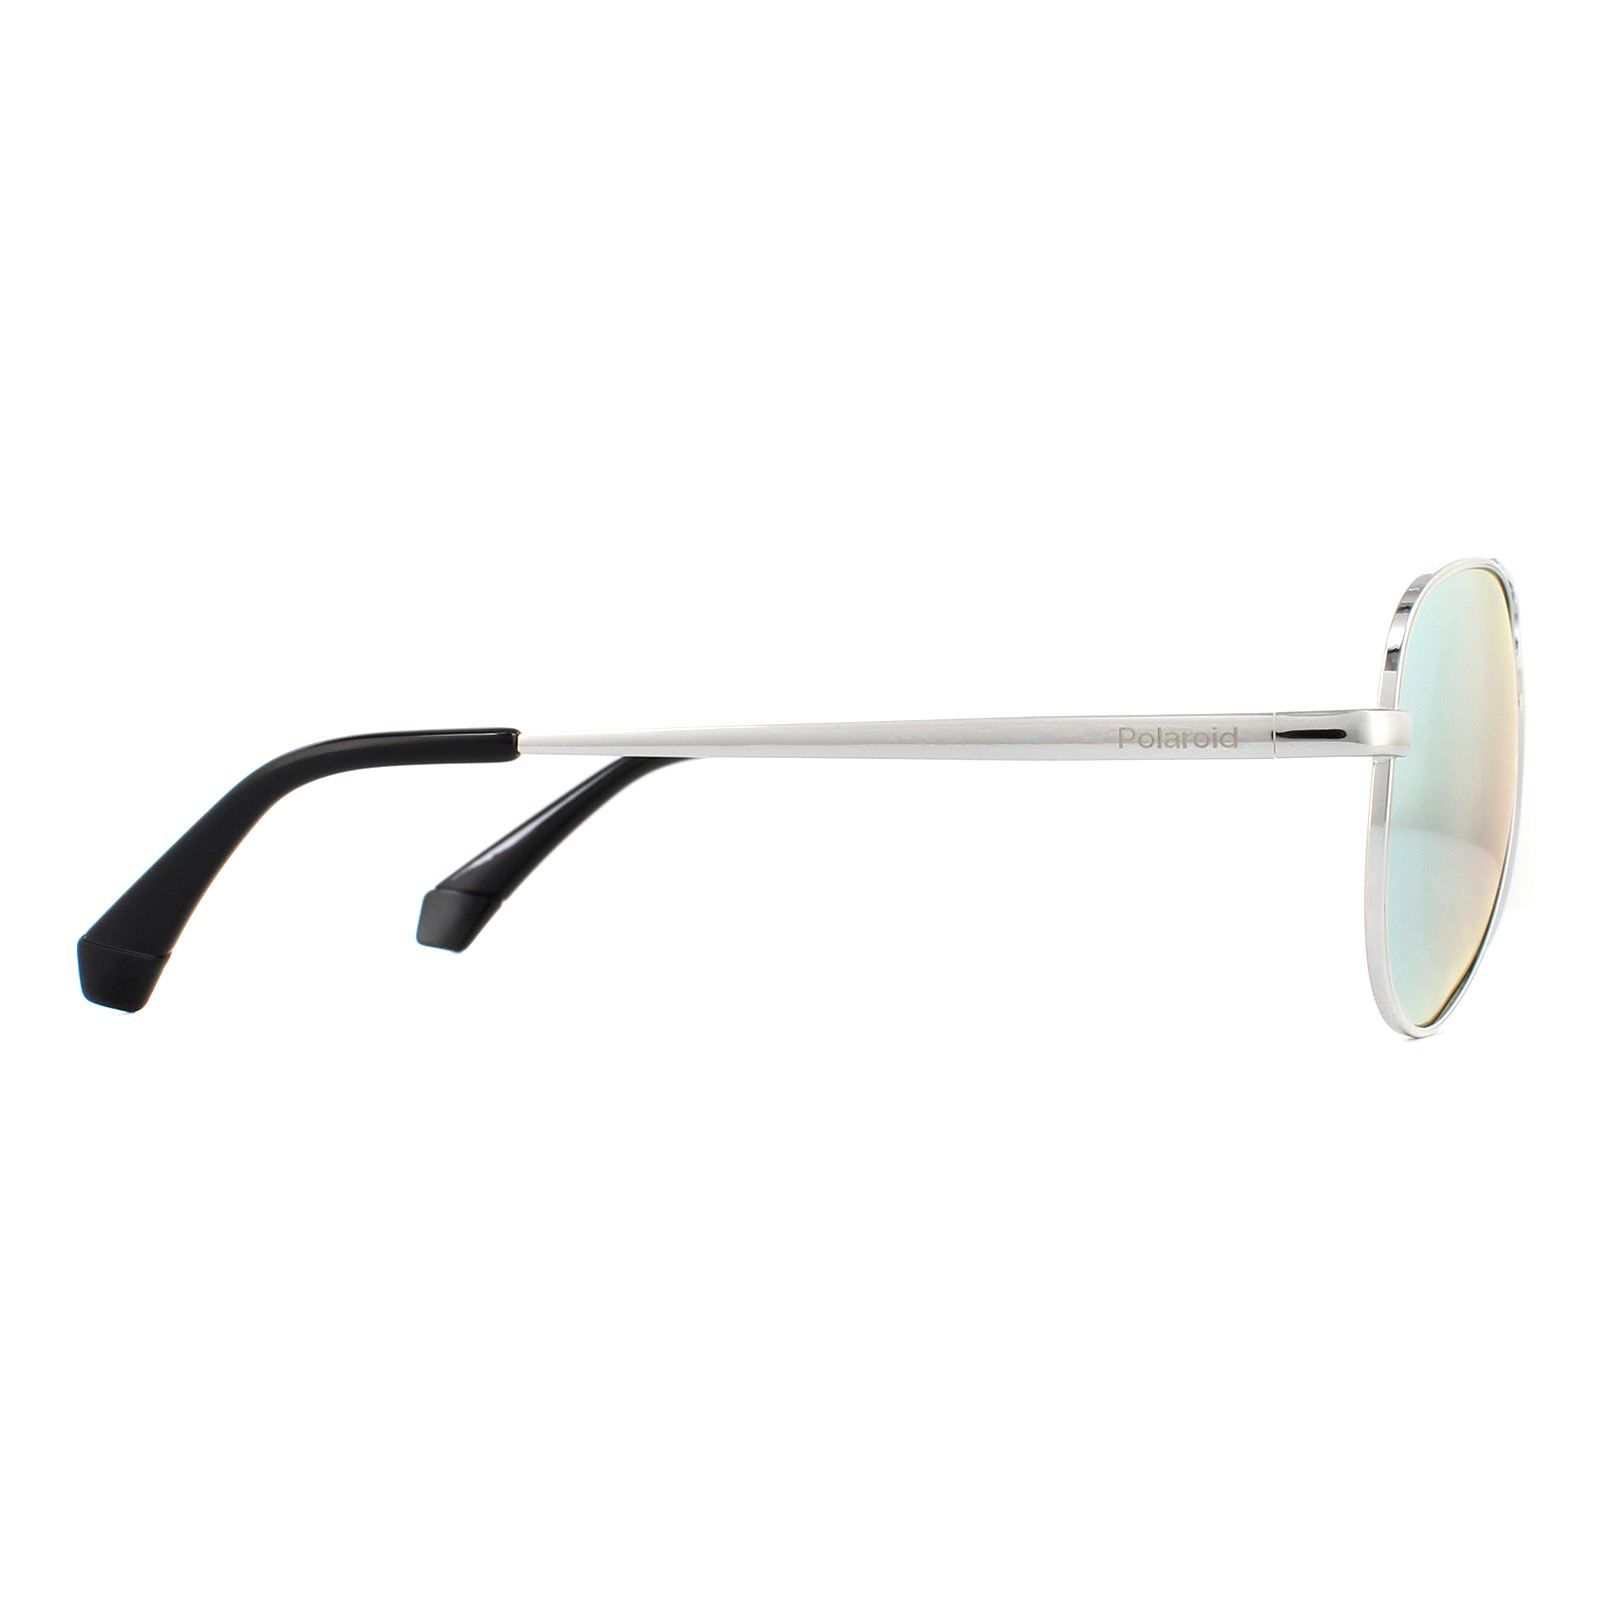 Polaroid Kids Sunglasses 8015/N/NEW 010 EX Palladium Grey Silver Mirror Polarized